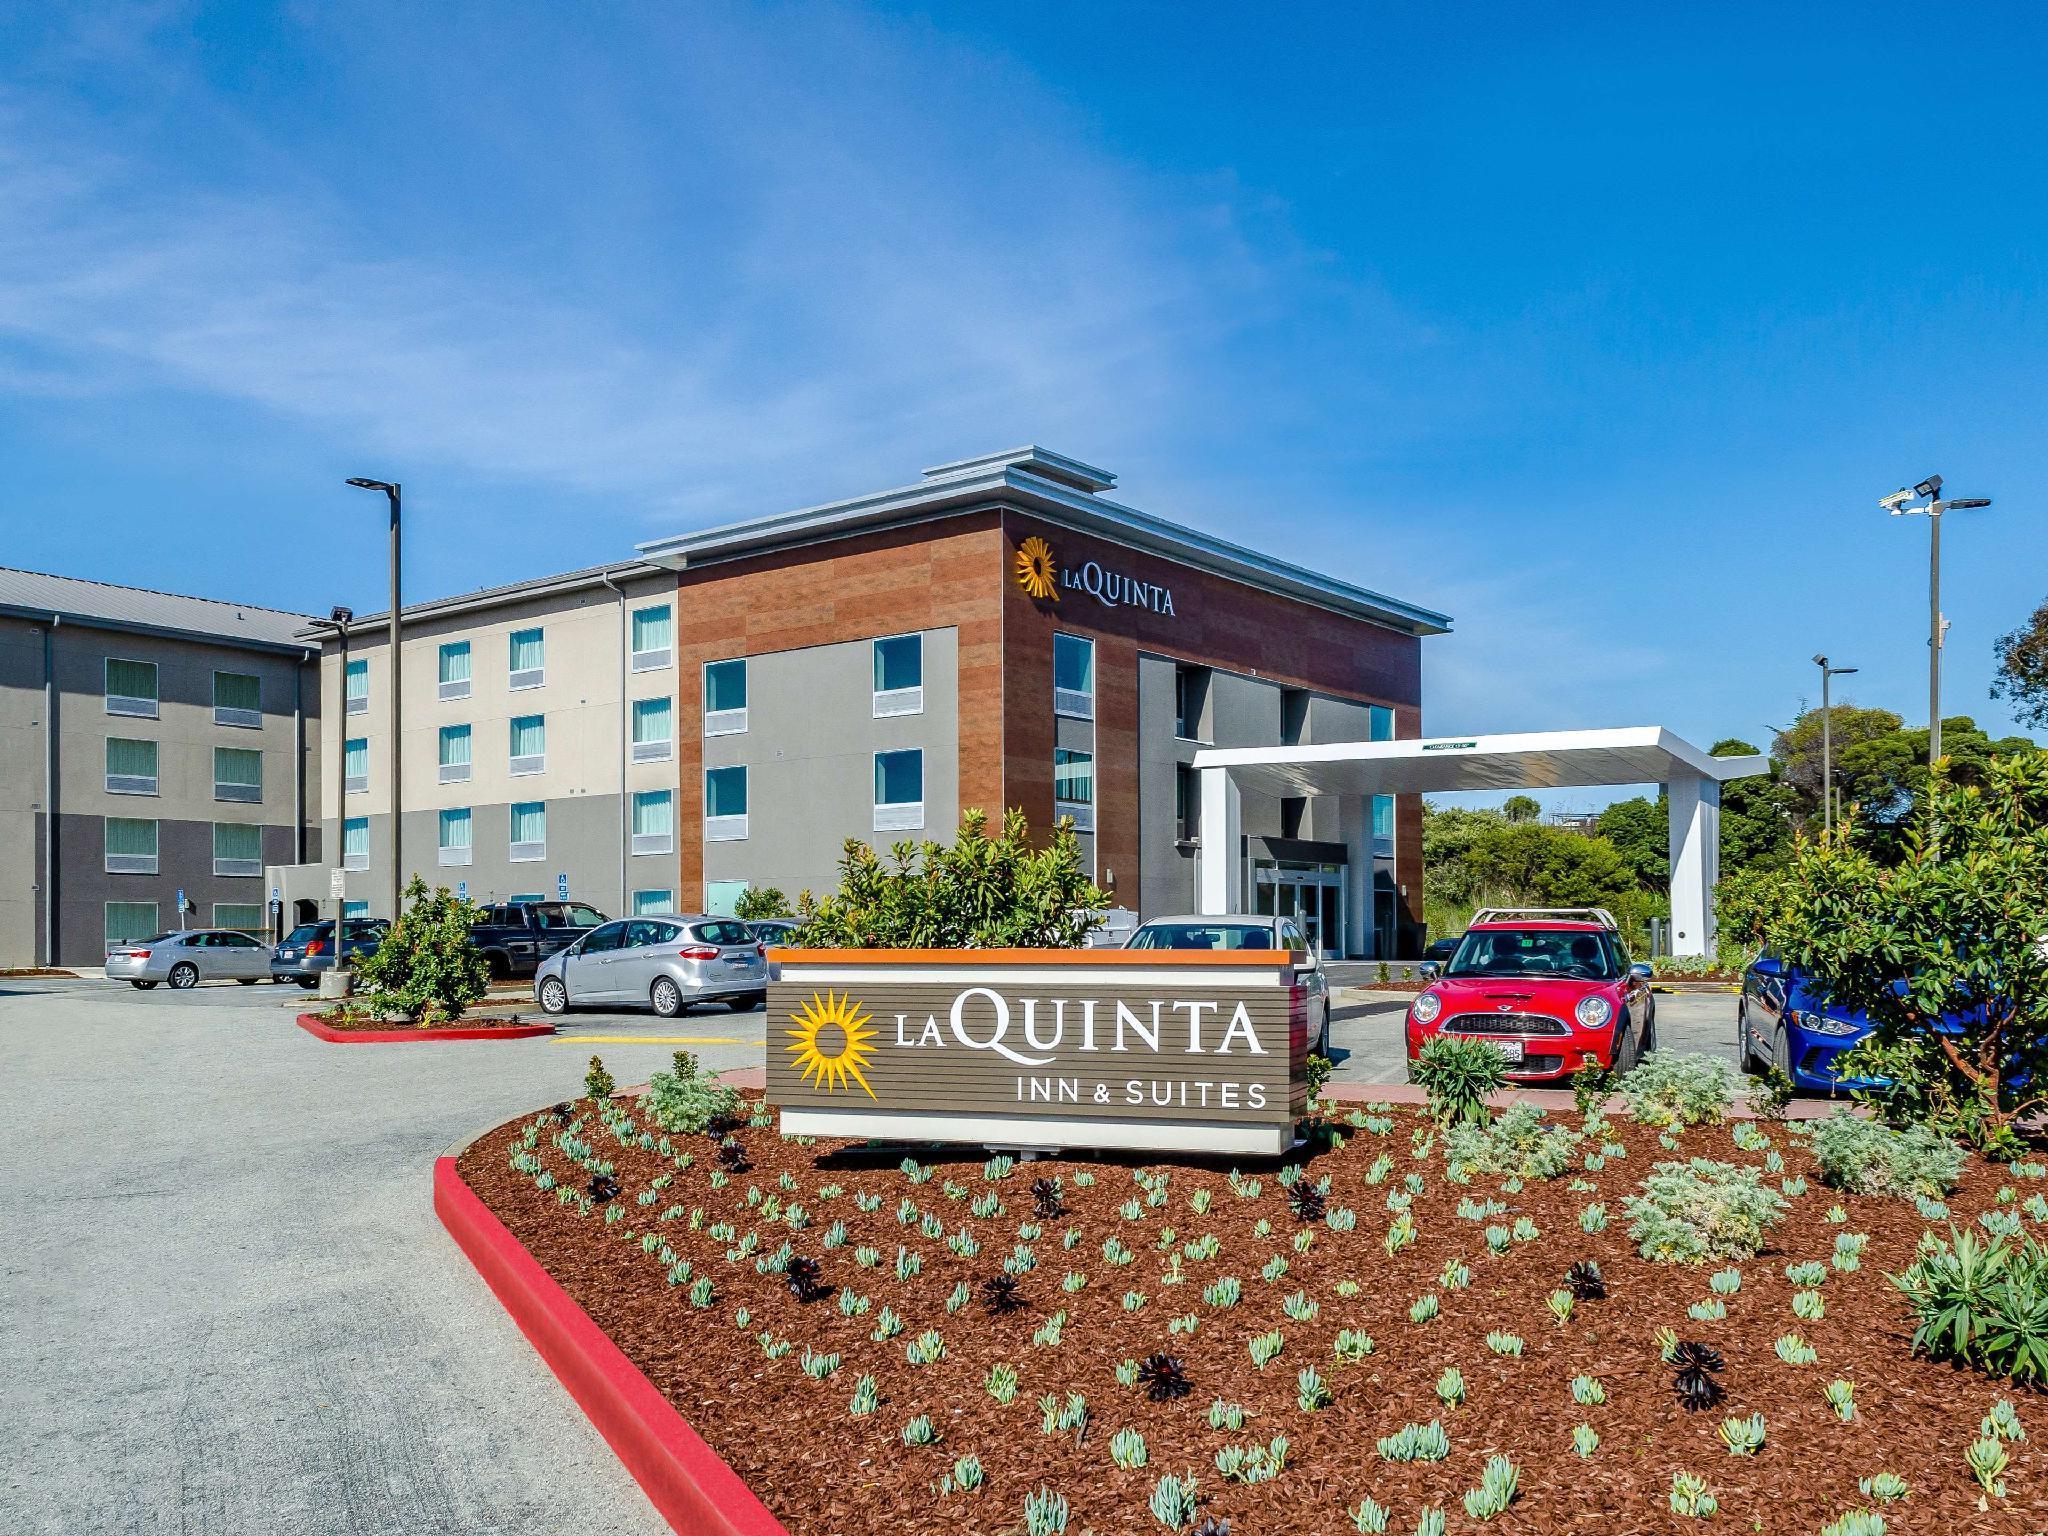 La Quinta Inn And Suites By Wyndham San Francisco Airport N